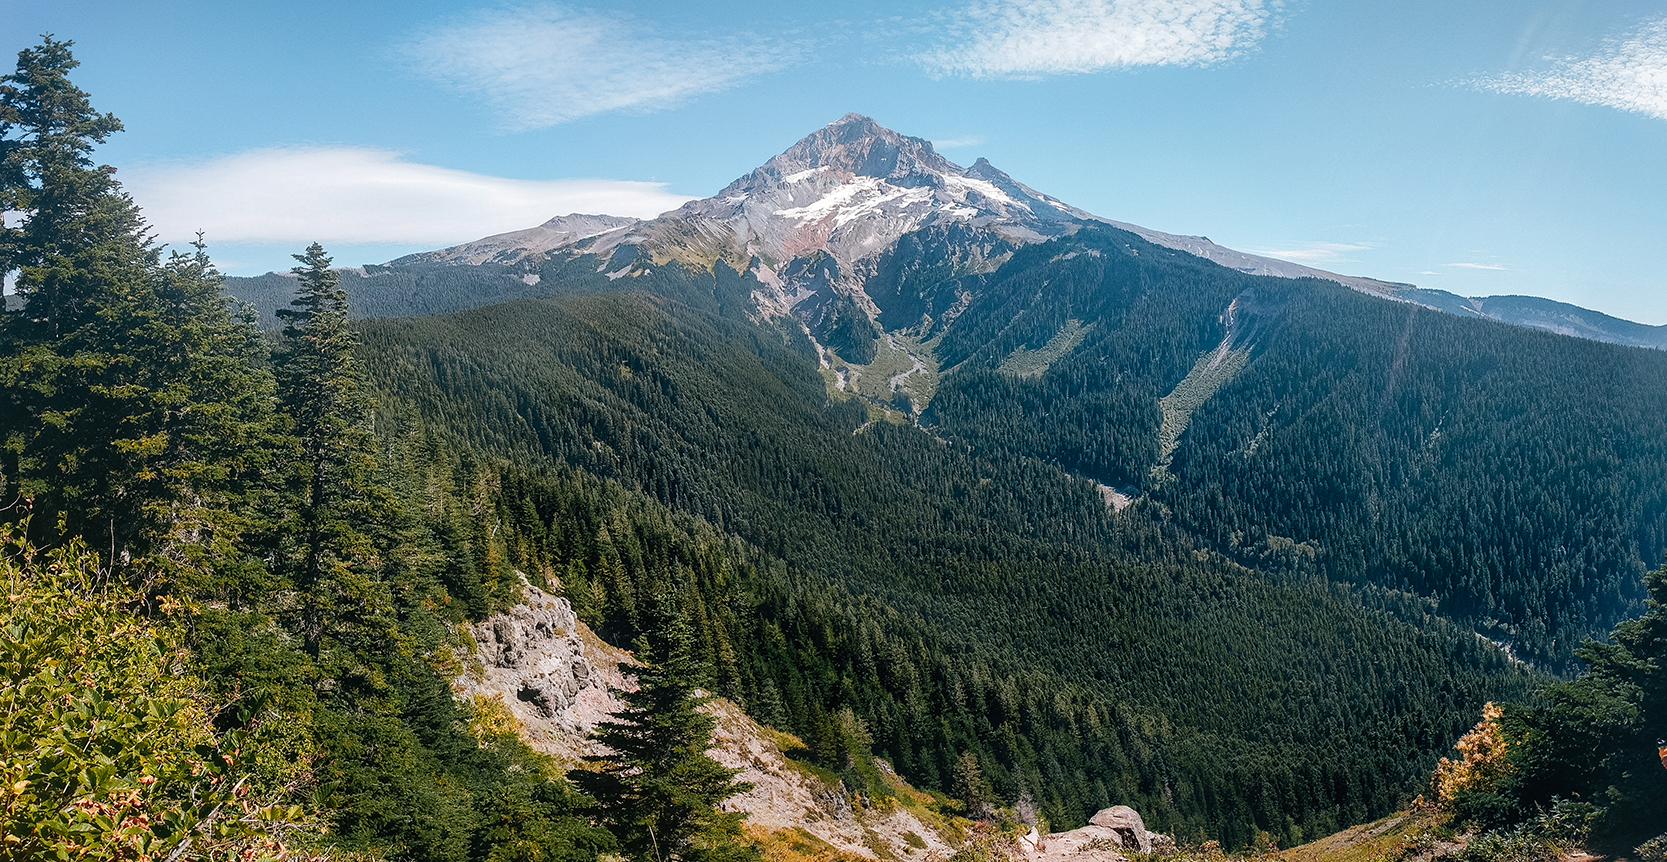 Mt. Hood Dog Mountain viewpoint